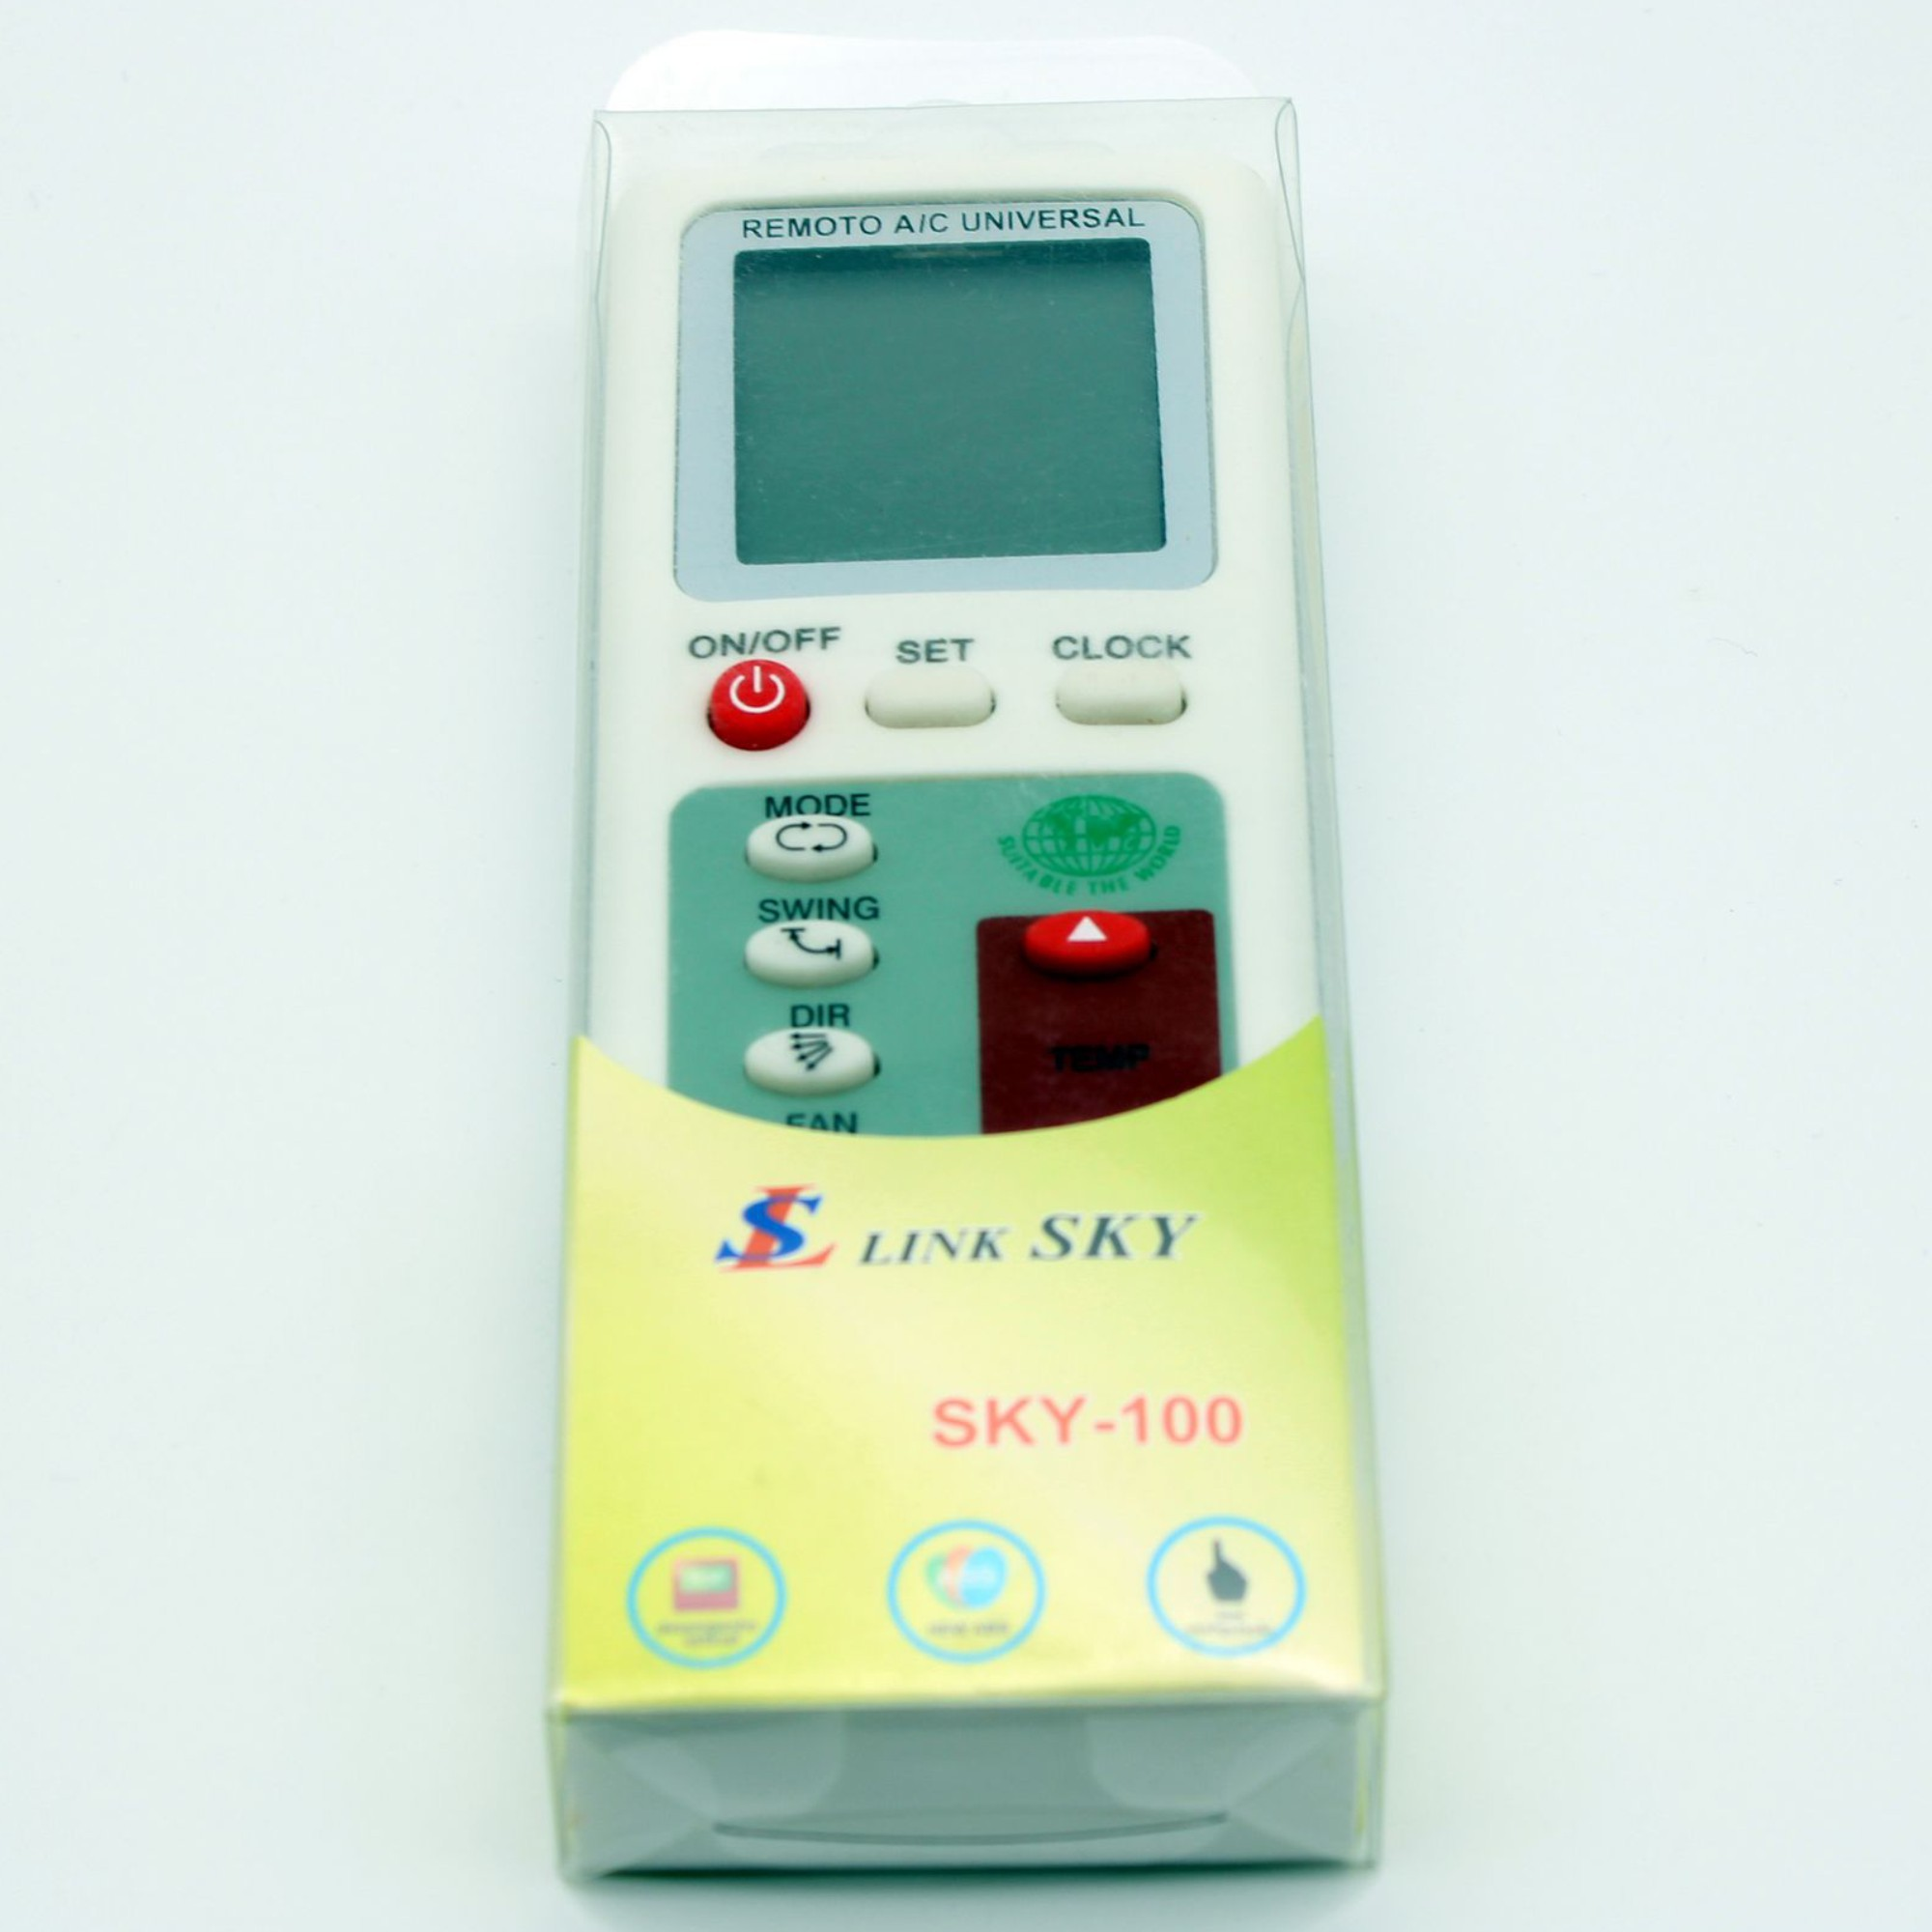 Controle Remoto Ar Condicionado Universal Sky-100